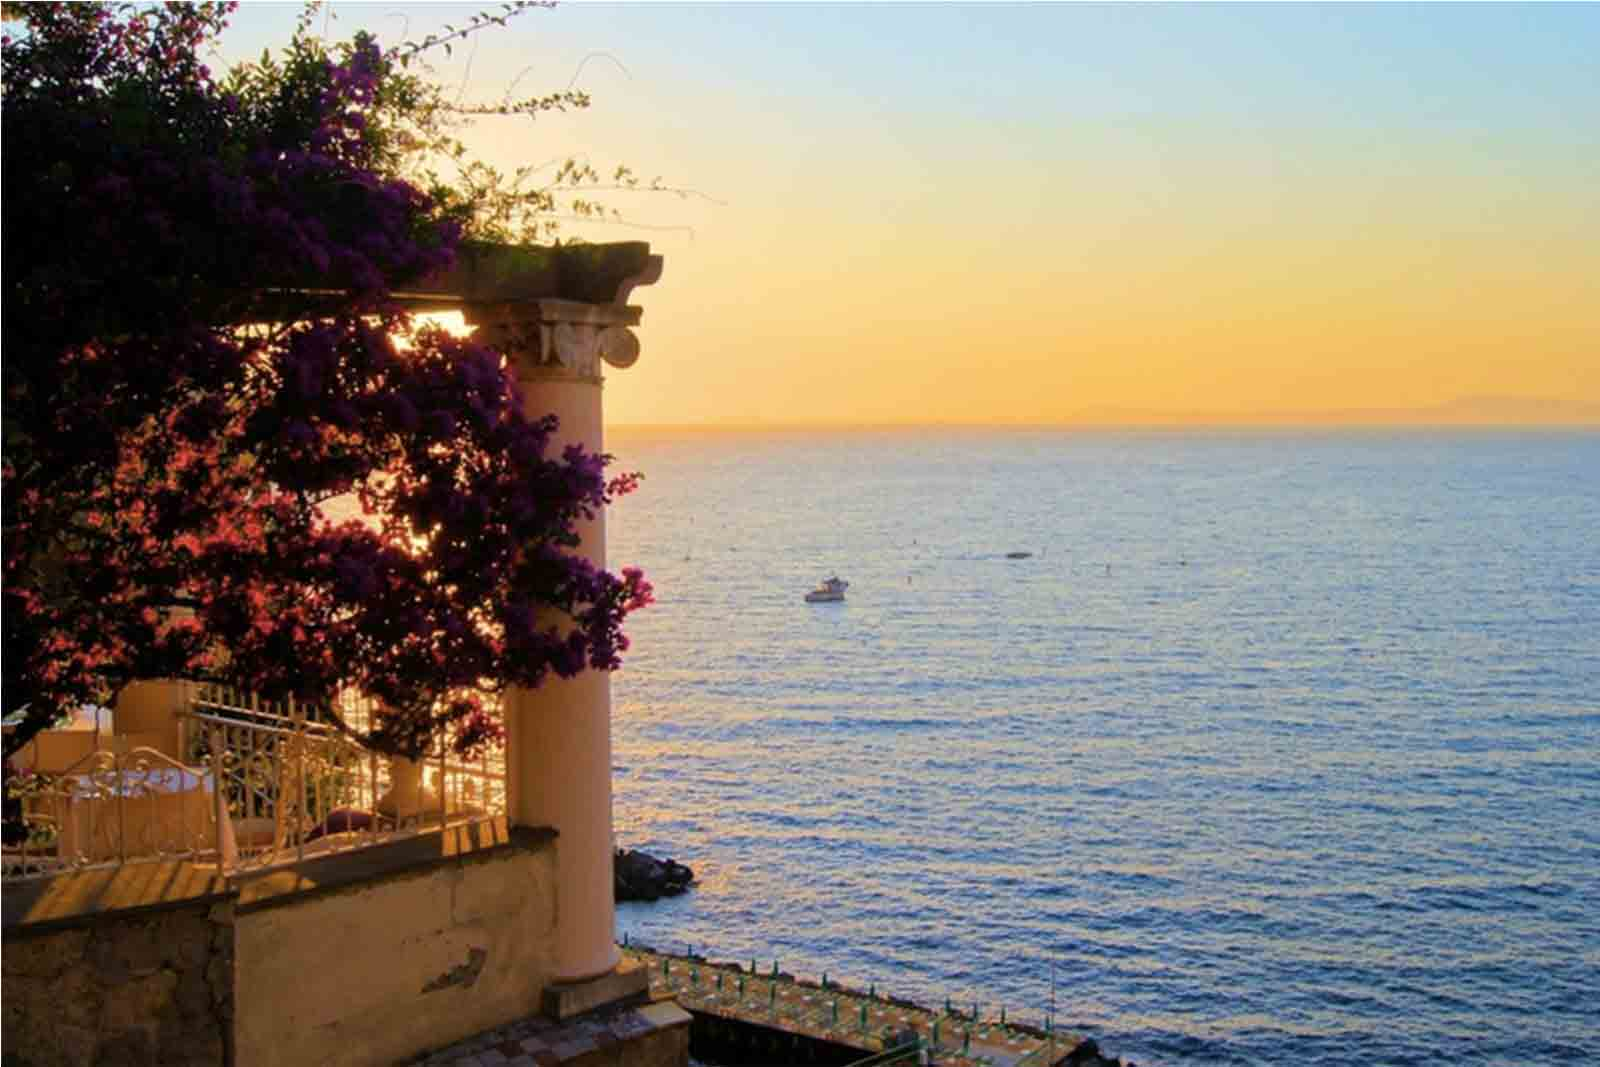 Romantic Amalfi Coast for your celebrations 10-day